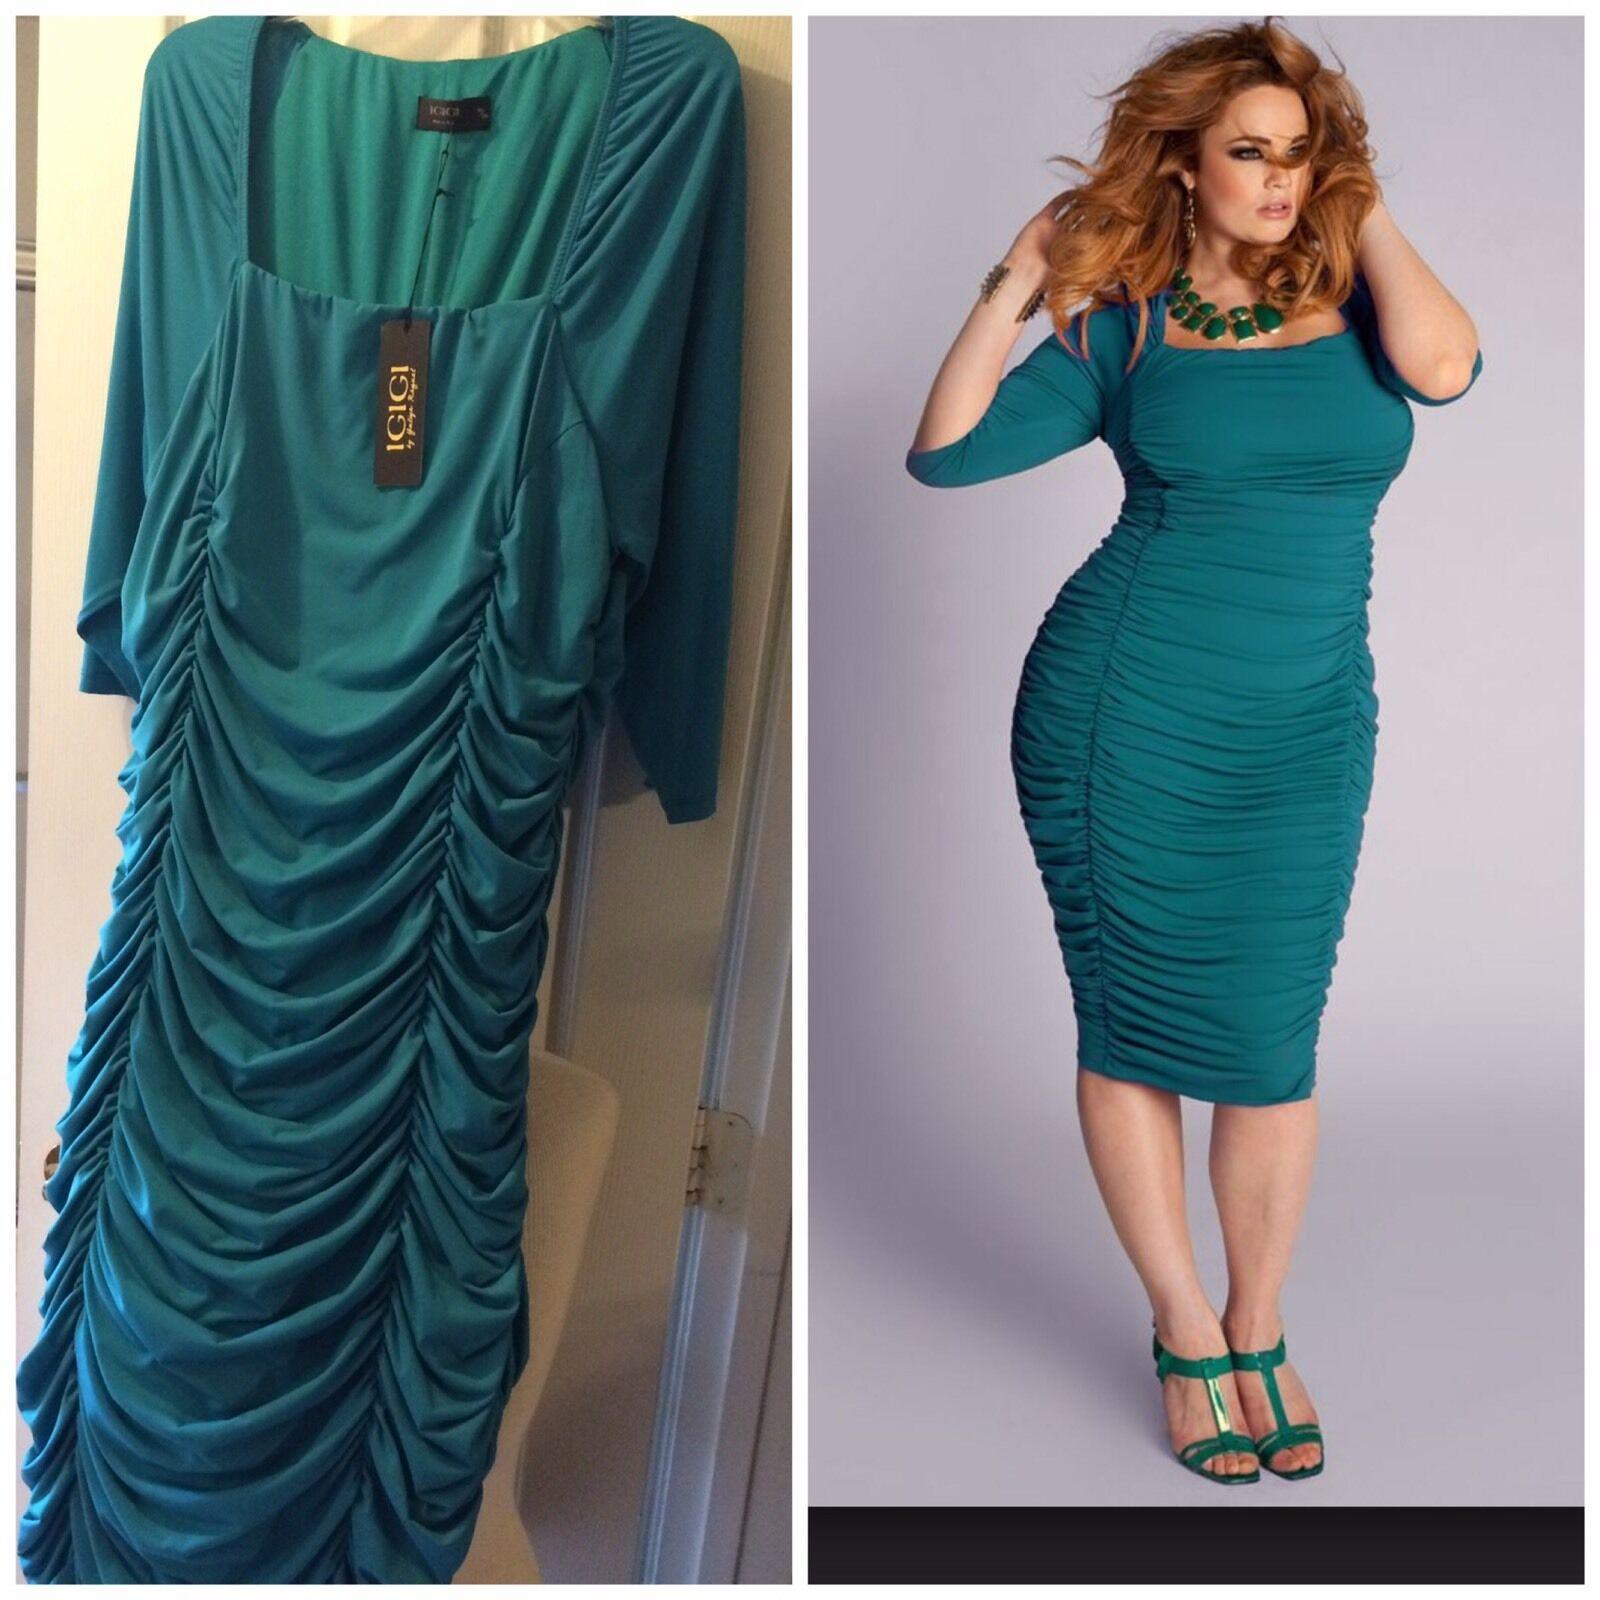 Igigi Renata 18 20 Jade Green Dress NEW